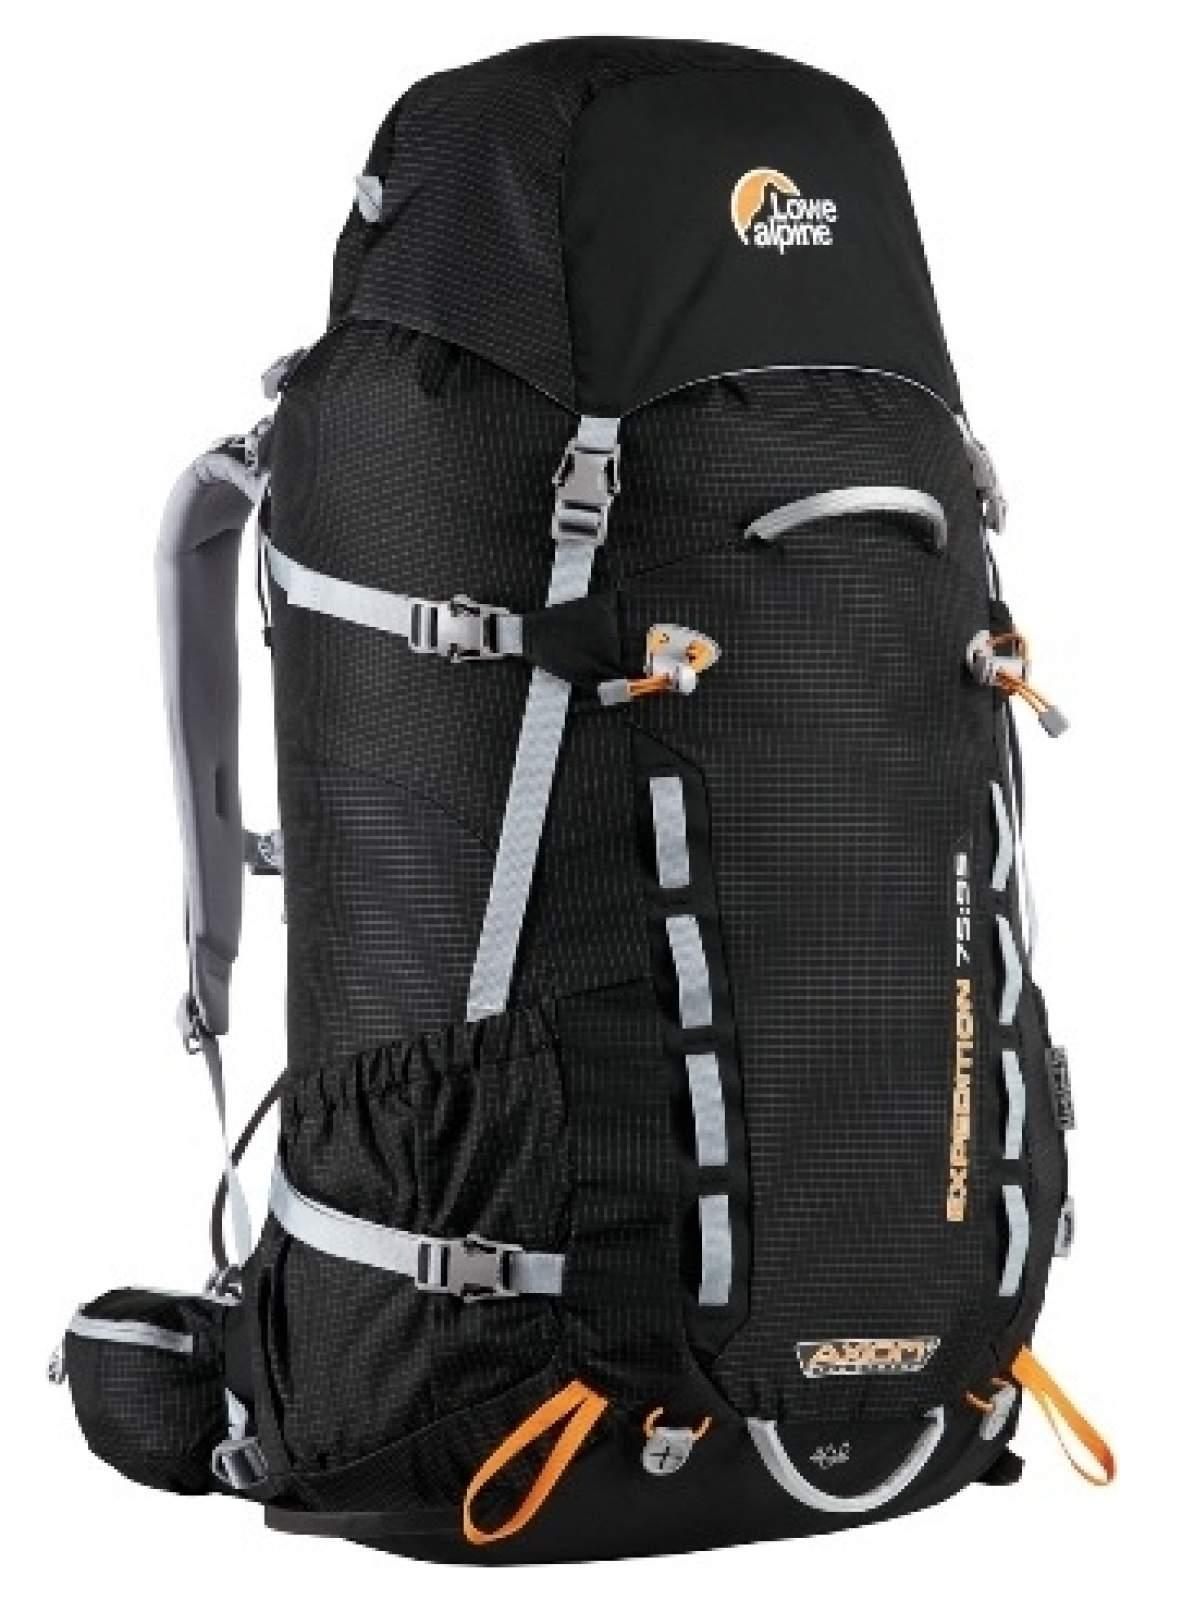 ce8a280ab75c Lowe Alpine Рюкзак Lowe Alpine Axiom Expedition 75 95 – купить в ...